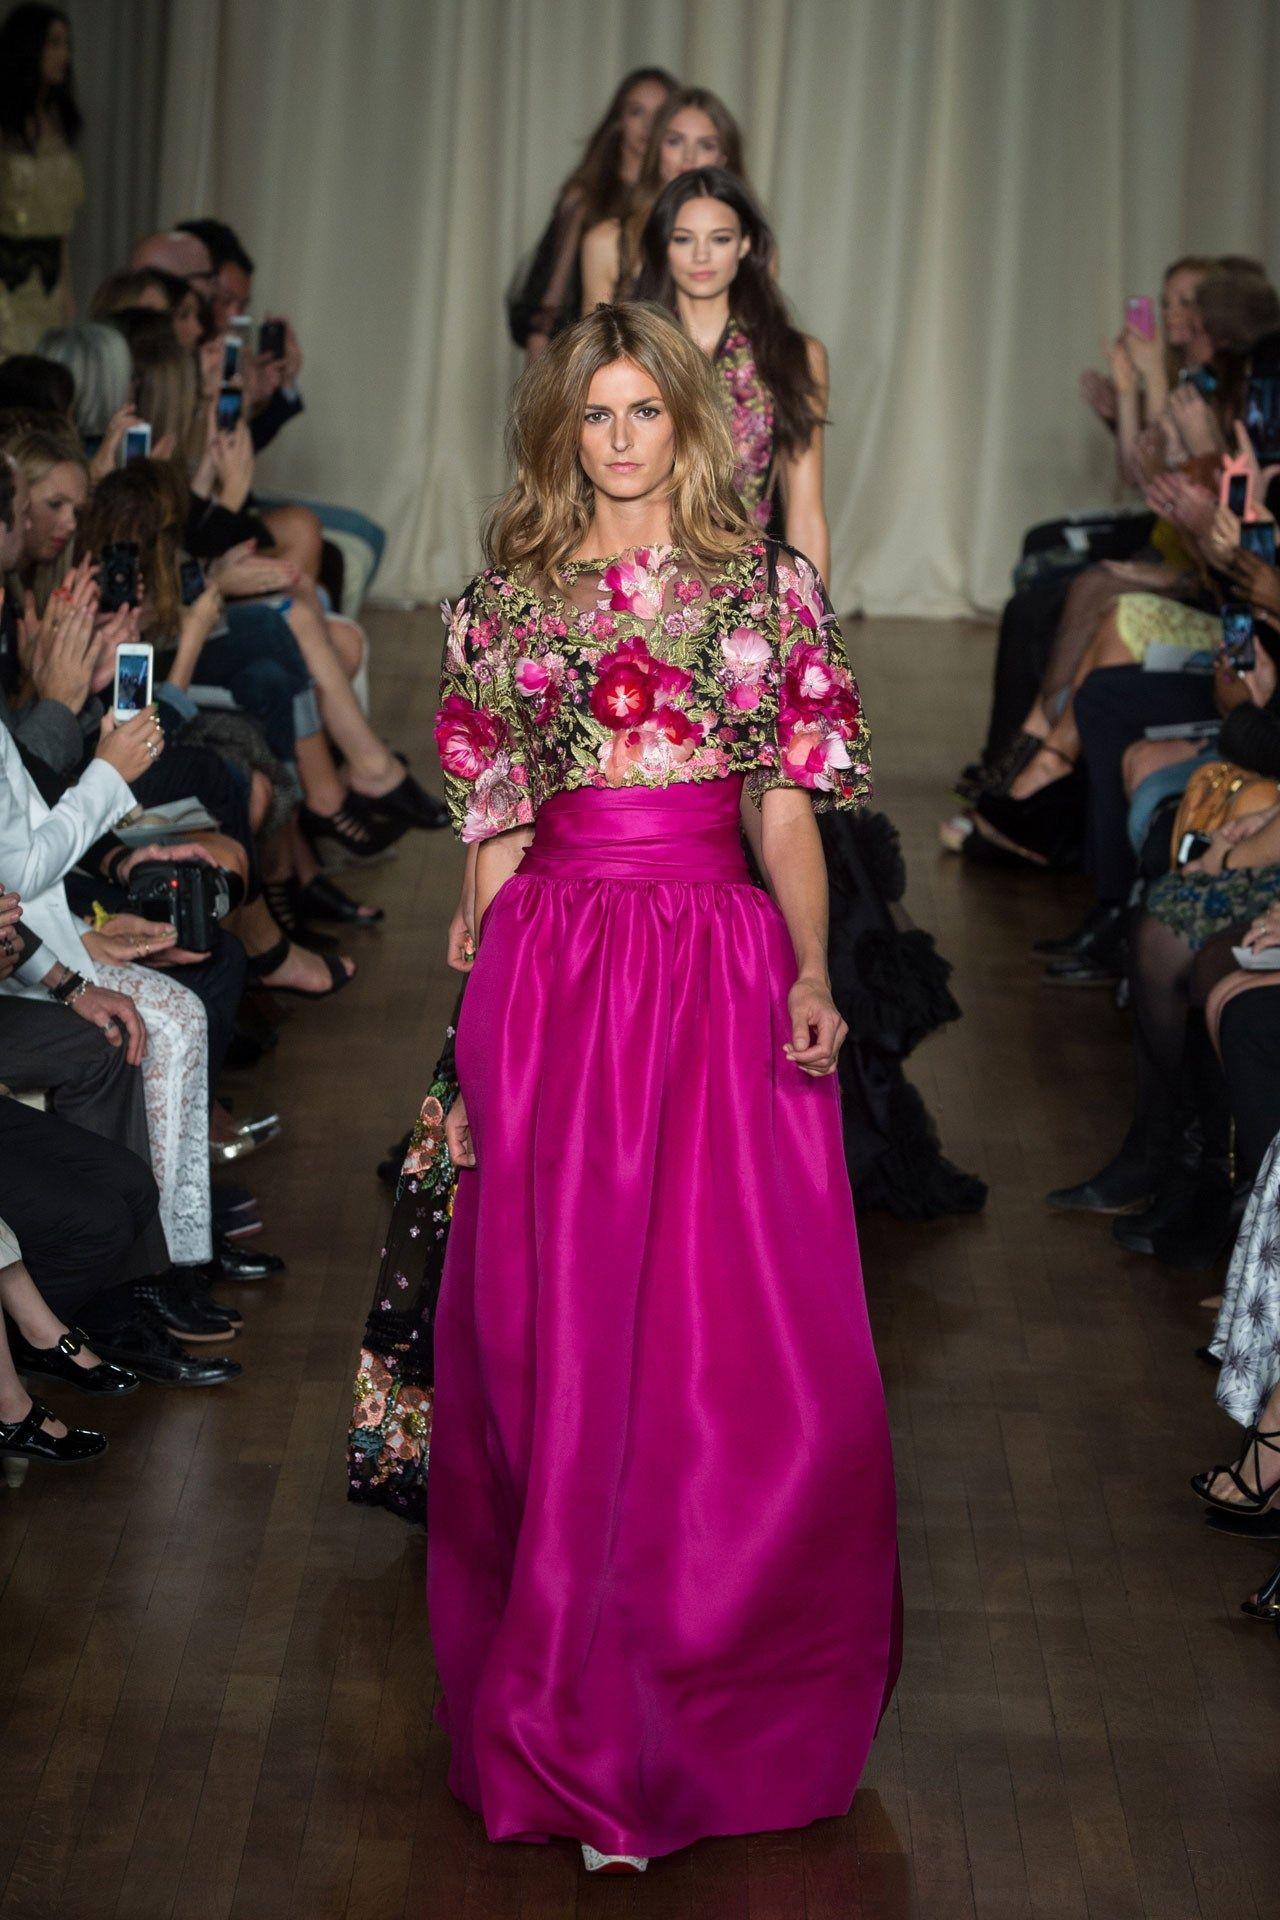 Suzy Menkes at London Fashion Week: Day Two | Desfiles, Vestido ...